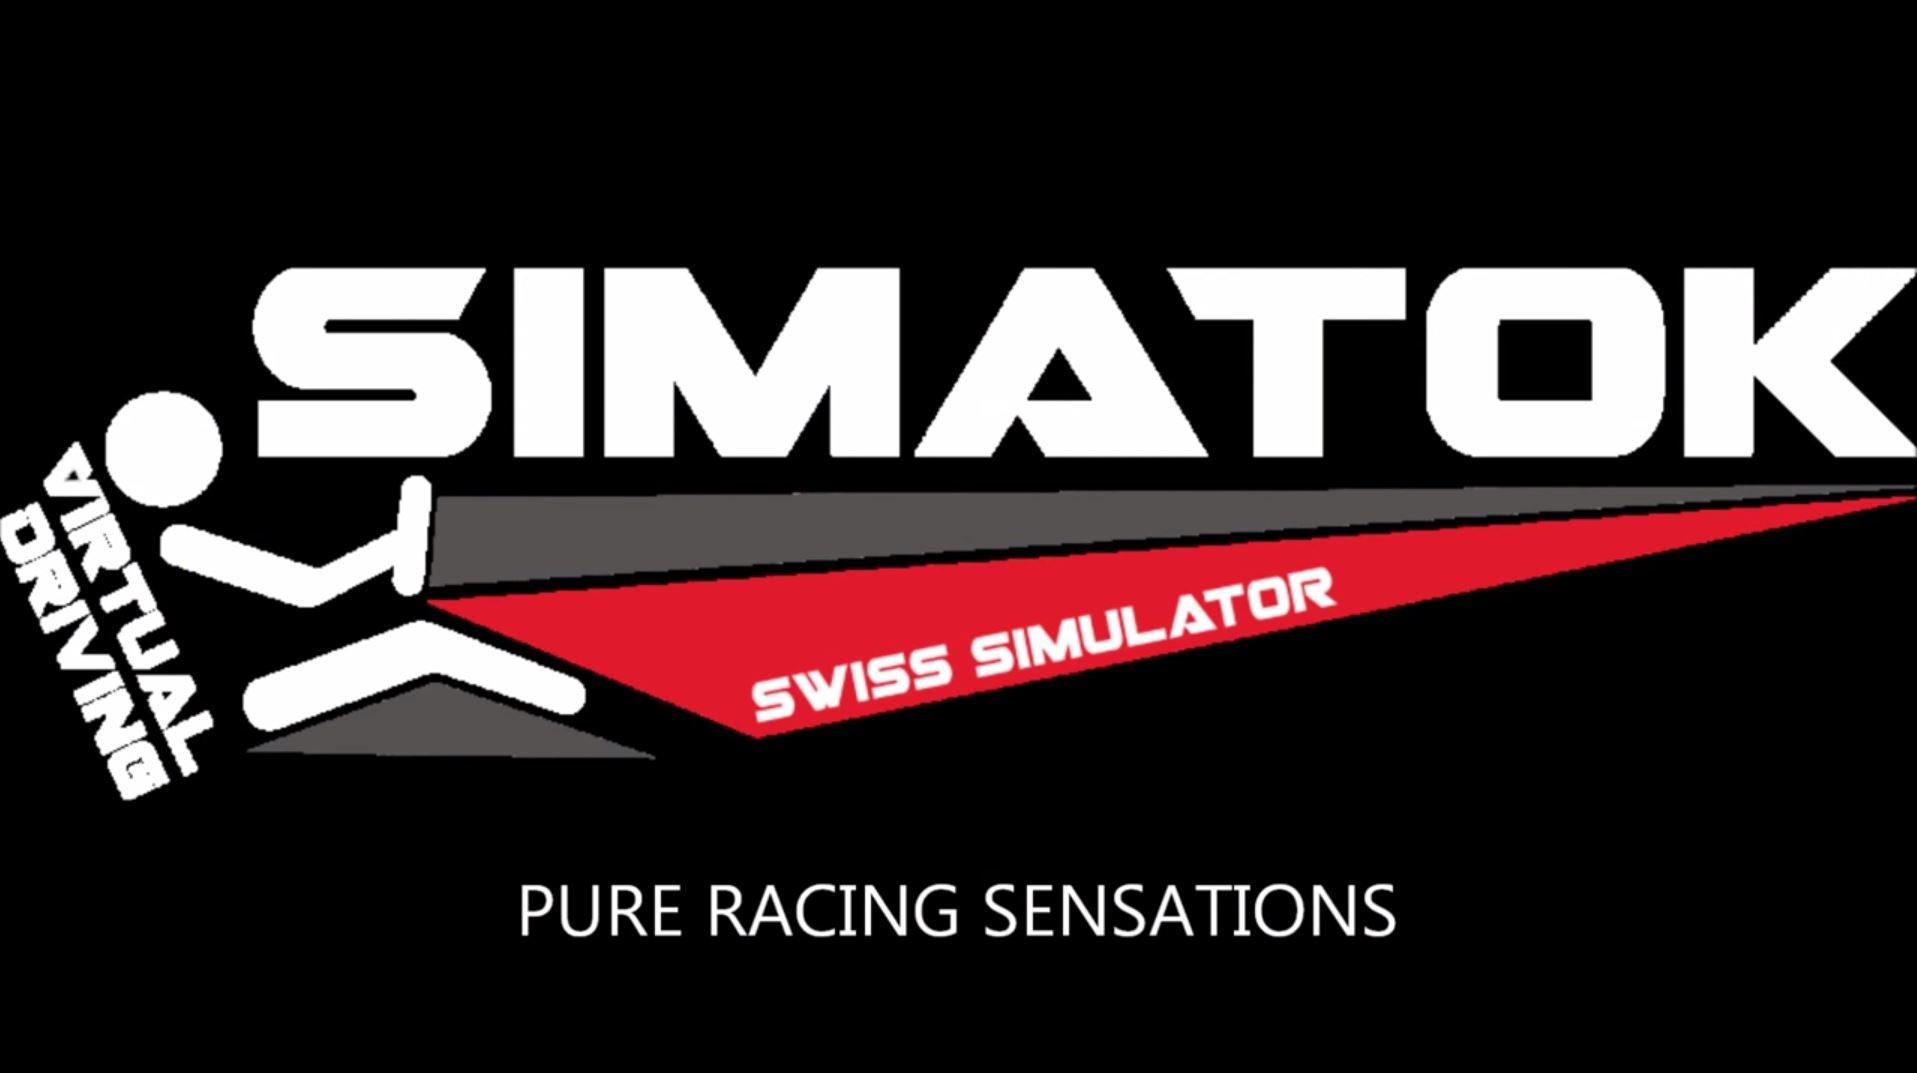 simatok paraplegic sim racing system inside sim racing. Black Bedroom Furniture Sets. Home Design Ideas